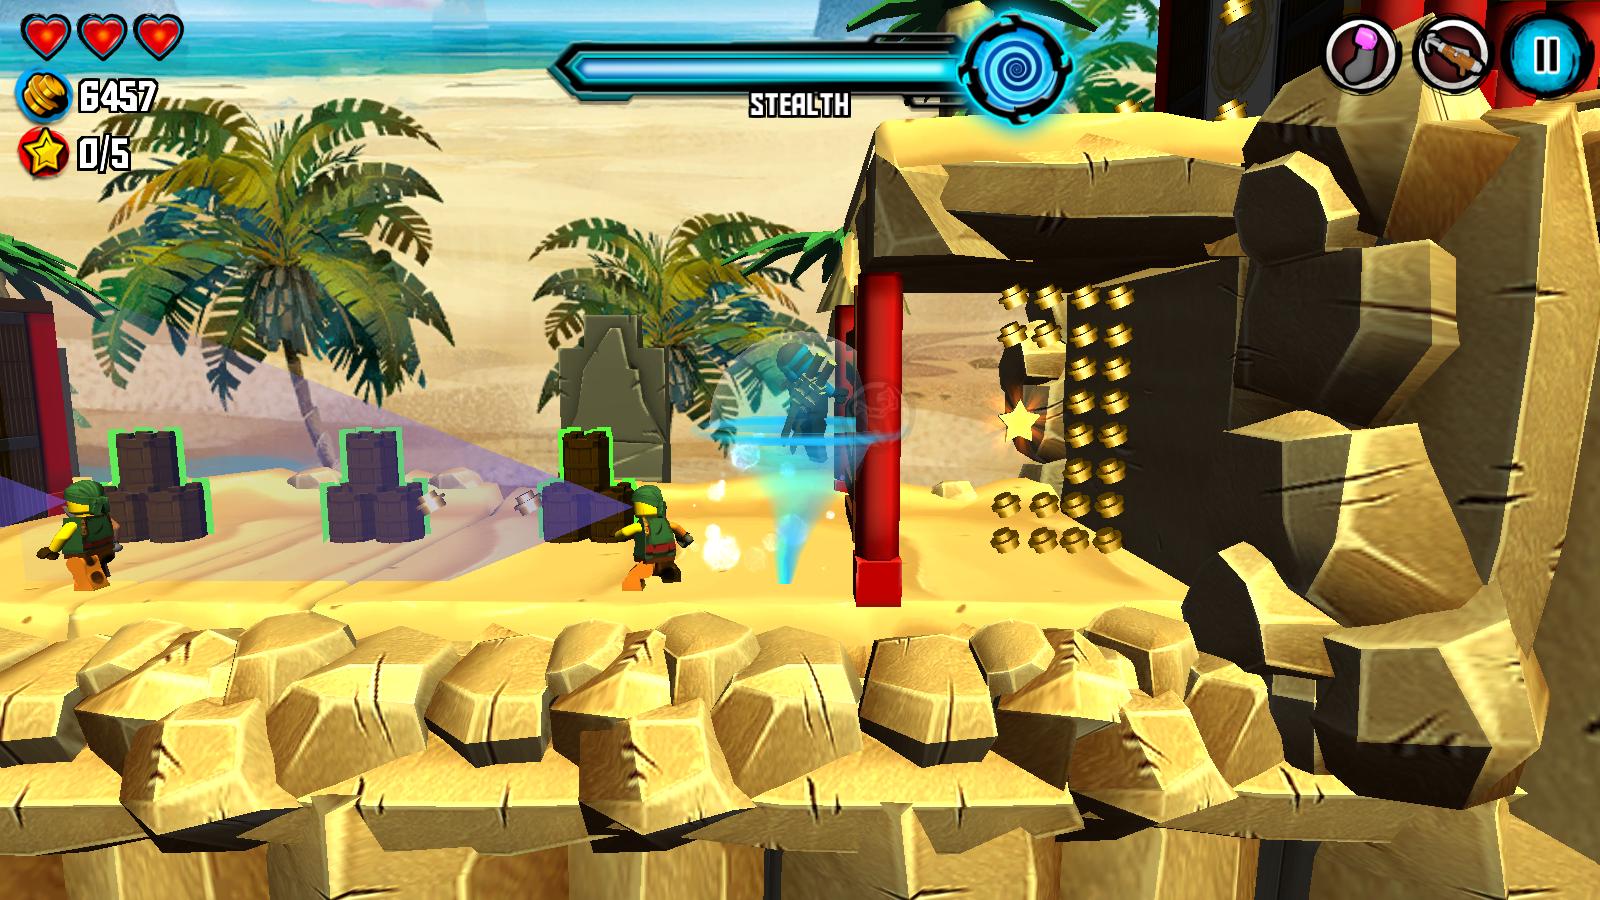 lego ninjago skybound screenshot